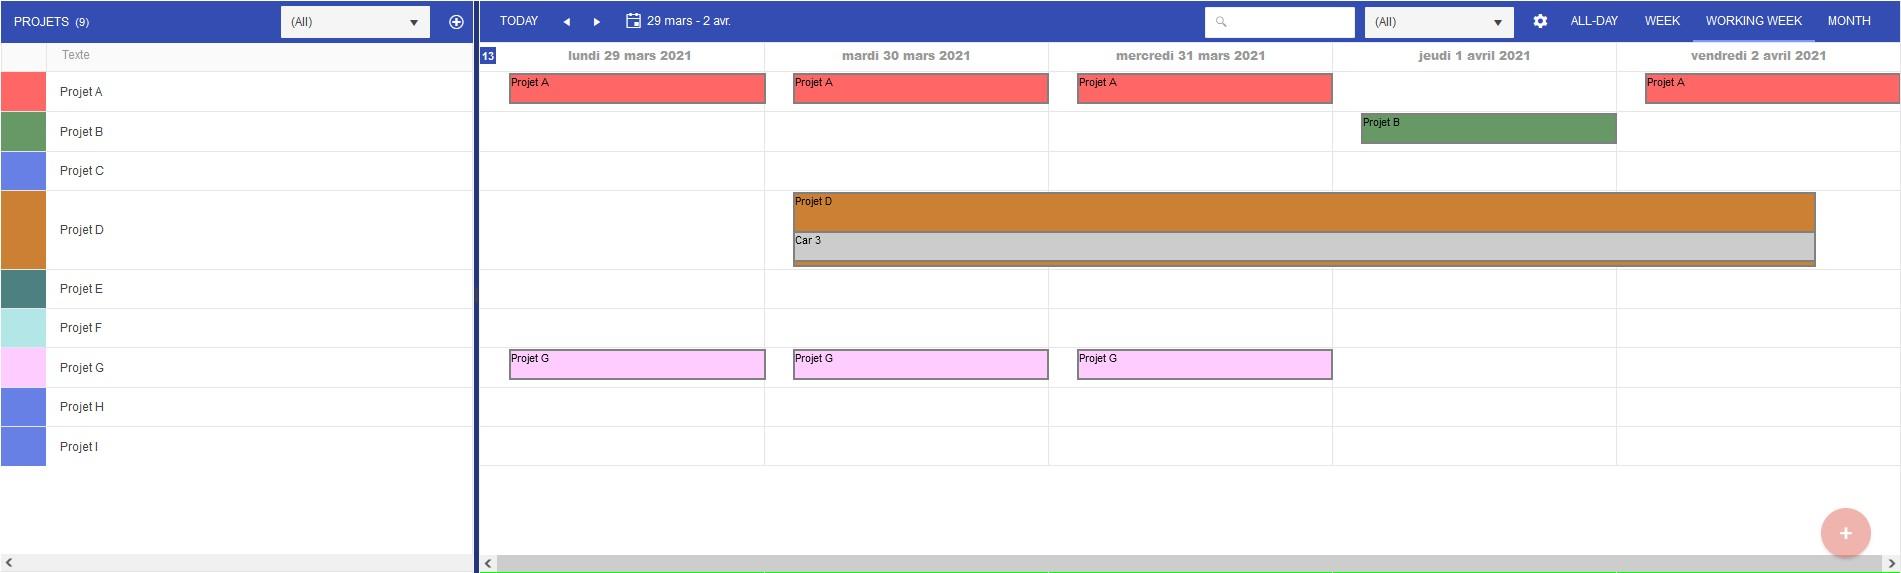 _vpportal_schedule_working_week_view